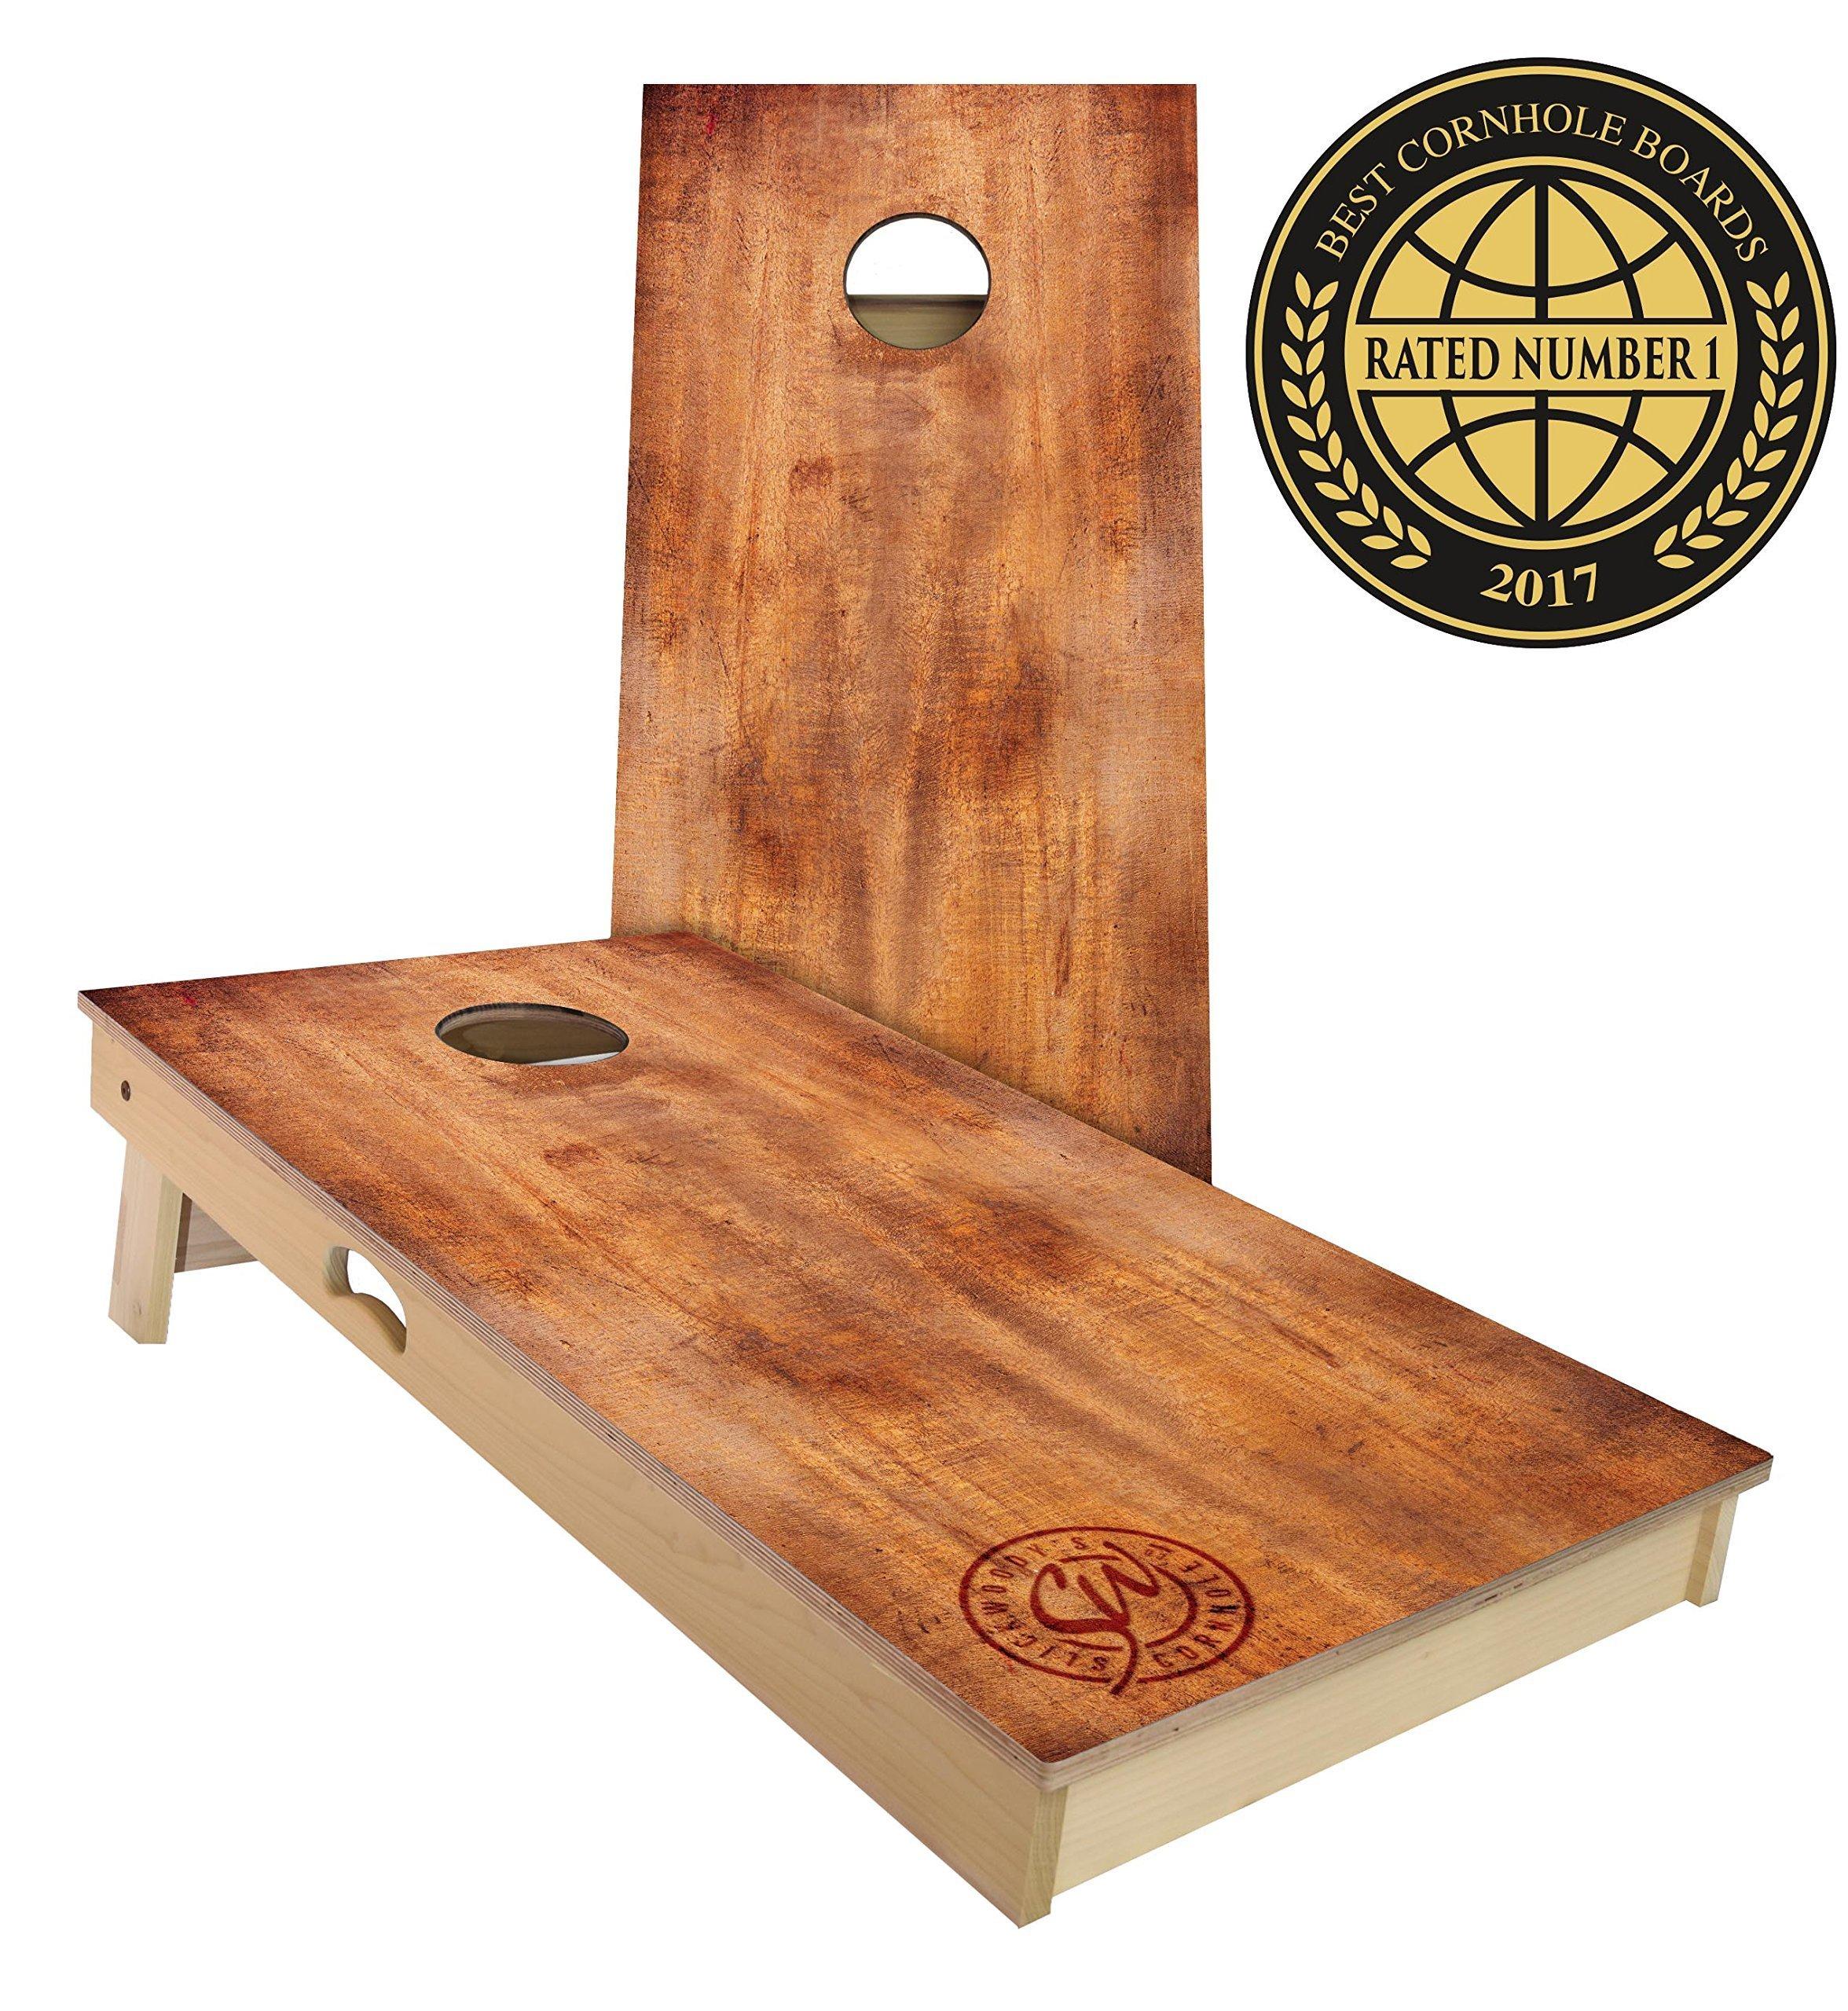 Slick Woody's Burnt Wood Cornhole Set, 4 by 2 Feet by Slick Woody's Cornhole Co.